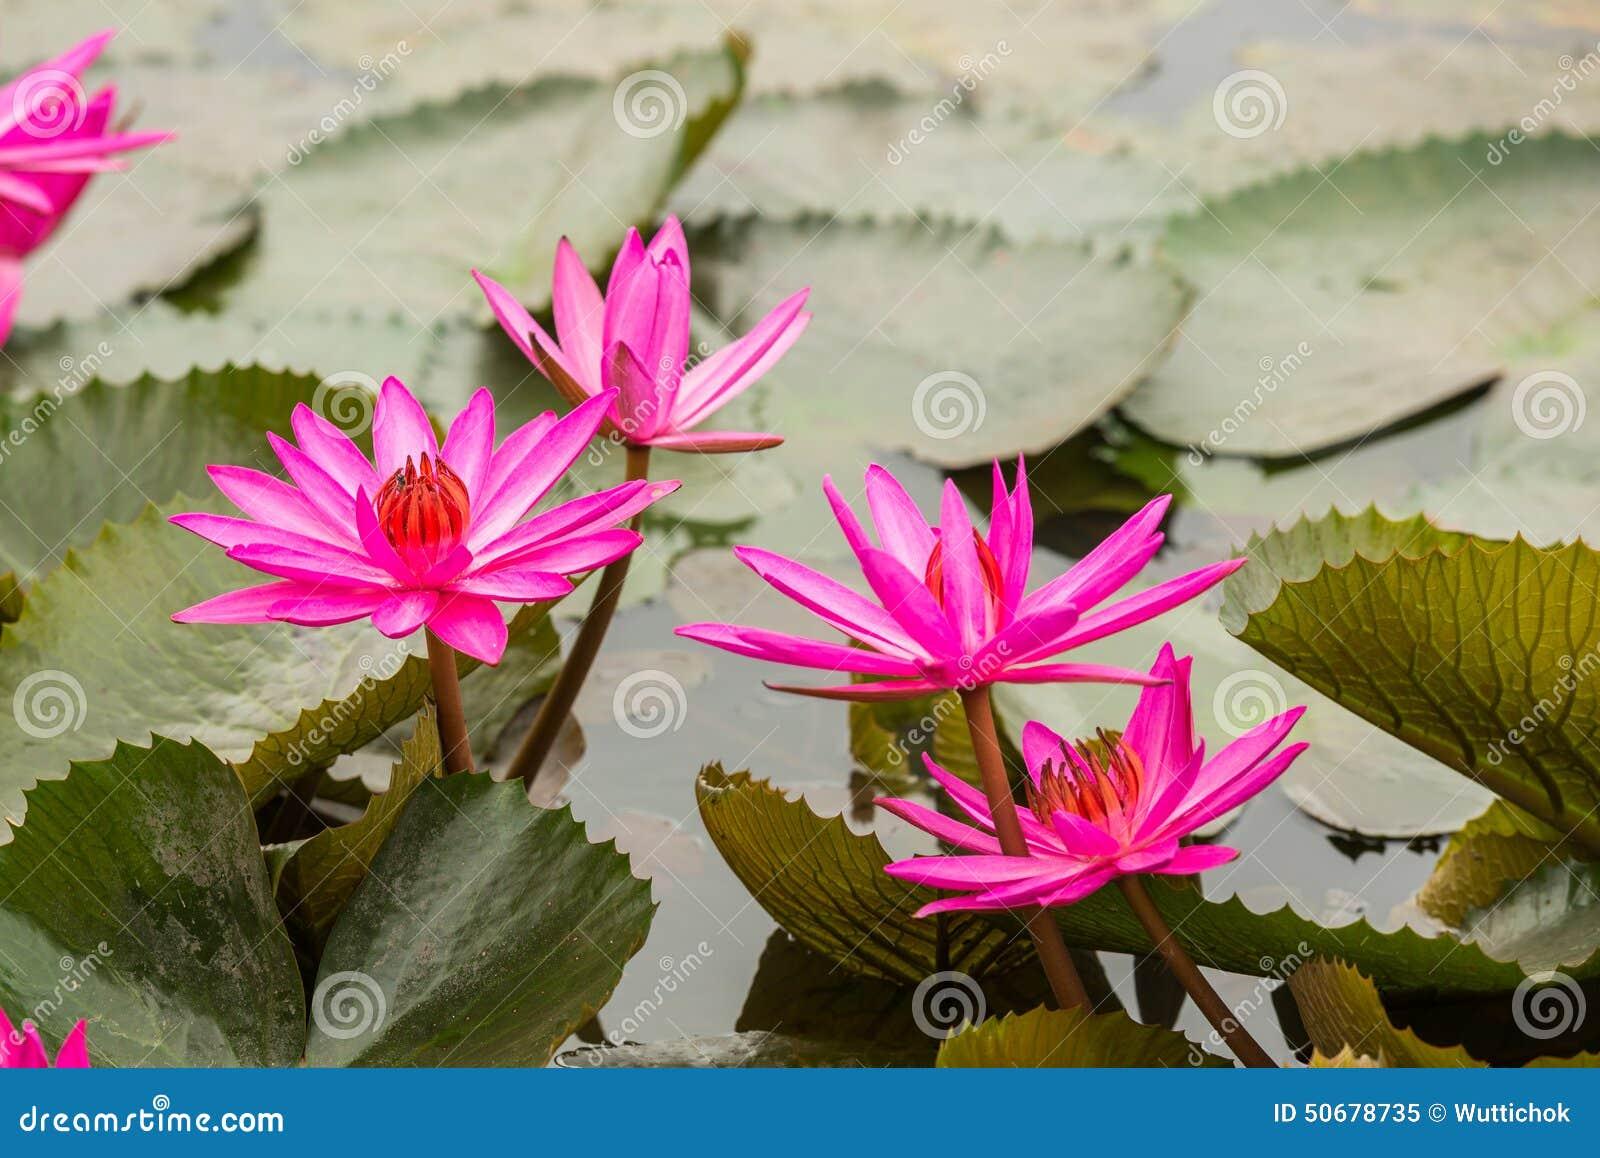 Download 桃红色颜色新鲜的莲花开花 库存图片. 图片 包括有 百合, 对象, beauvoir, 庭院, bossies - 50678735